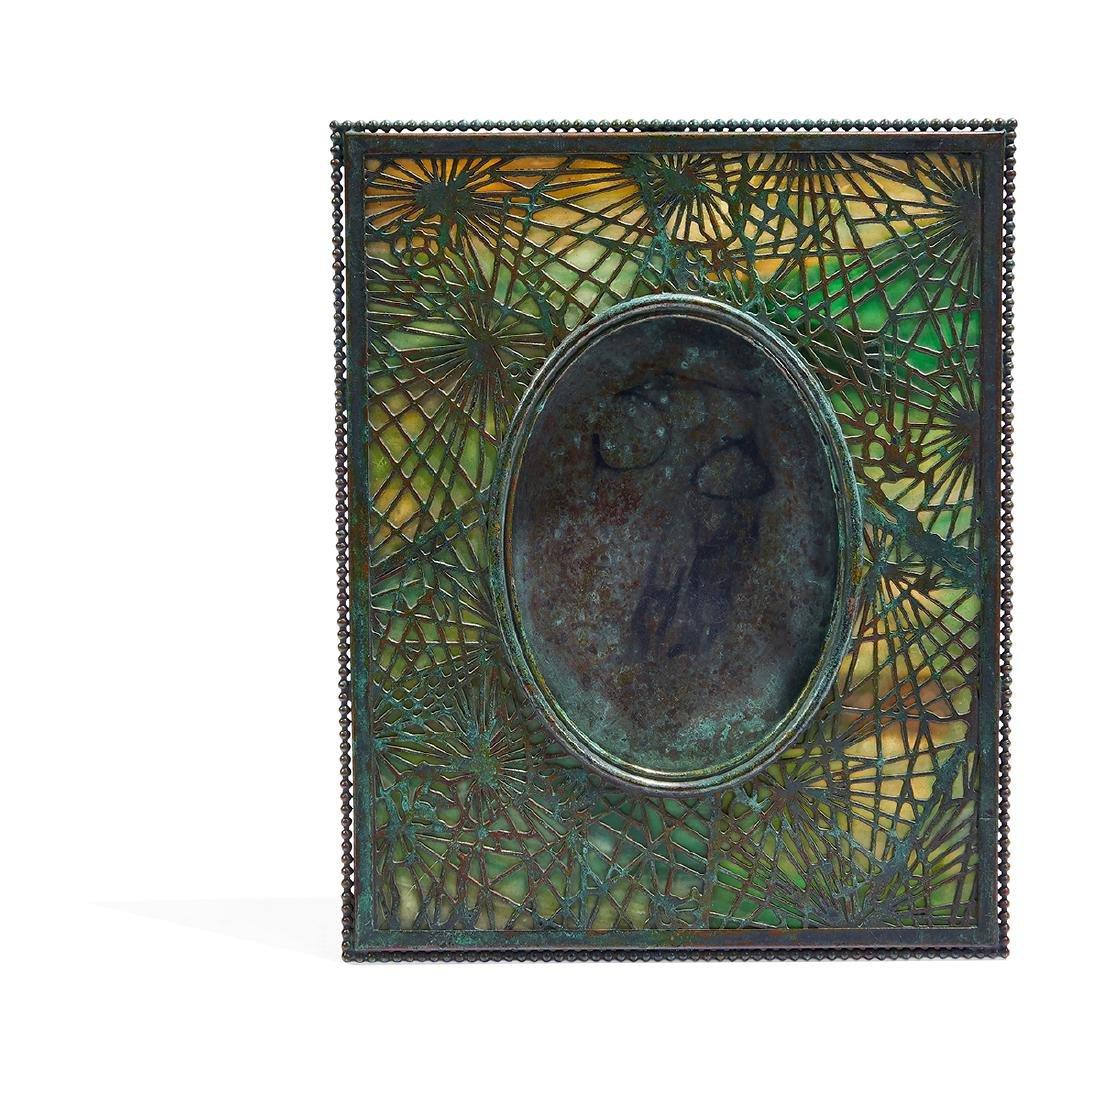 Tiffany Studios, Pine Needle Picture Frame, #946 - 2